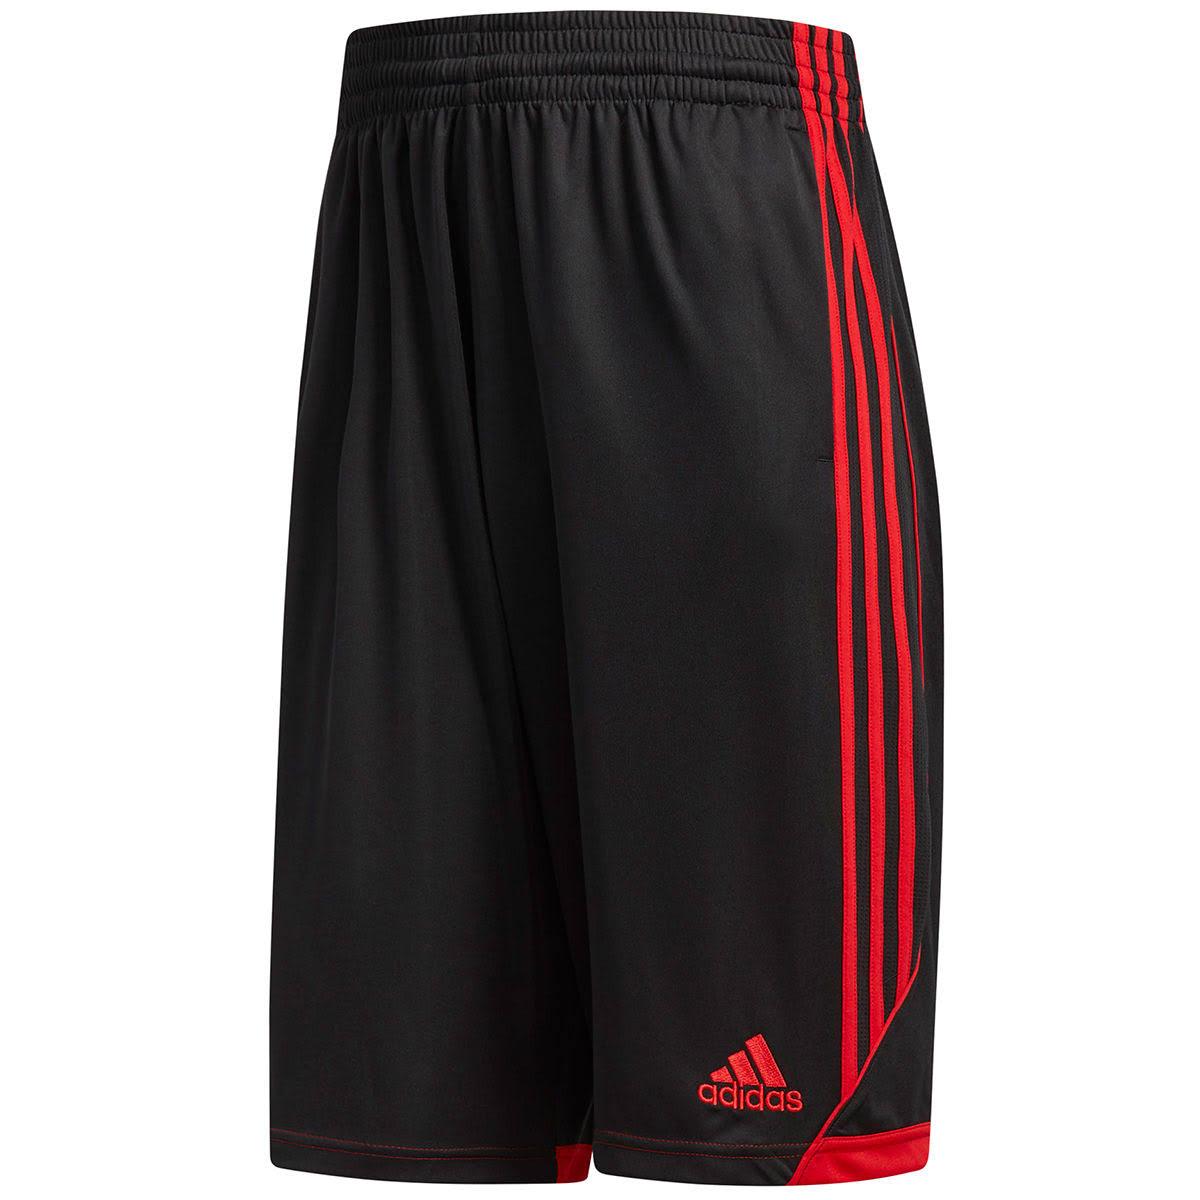 2 M Talla Mens Regular Cz1298 0 Speed Adidas 3g Cortos Pantalones zBI68